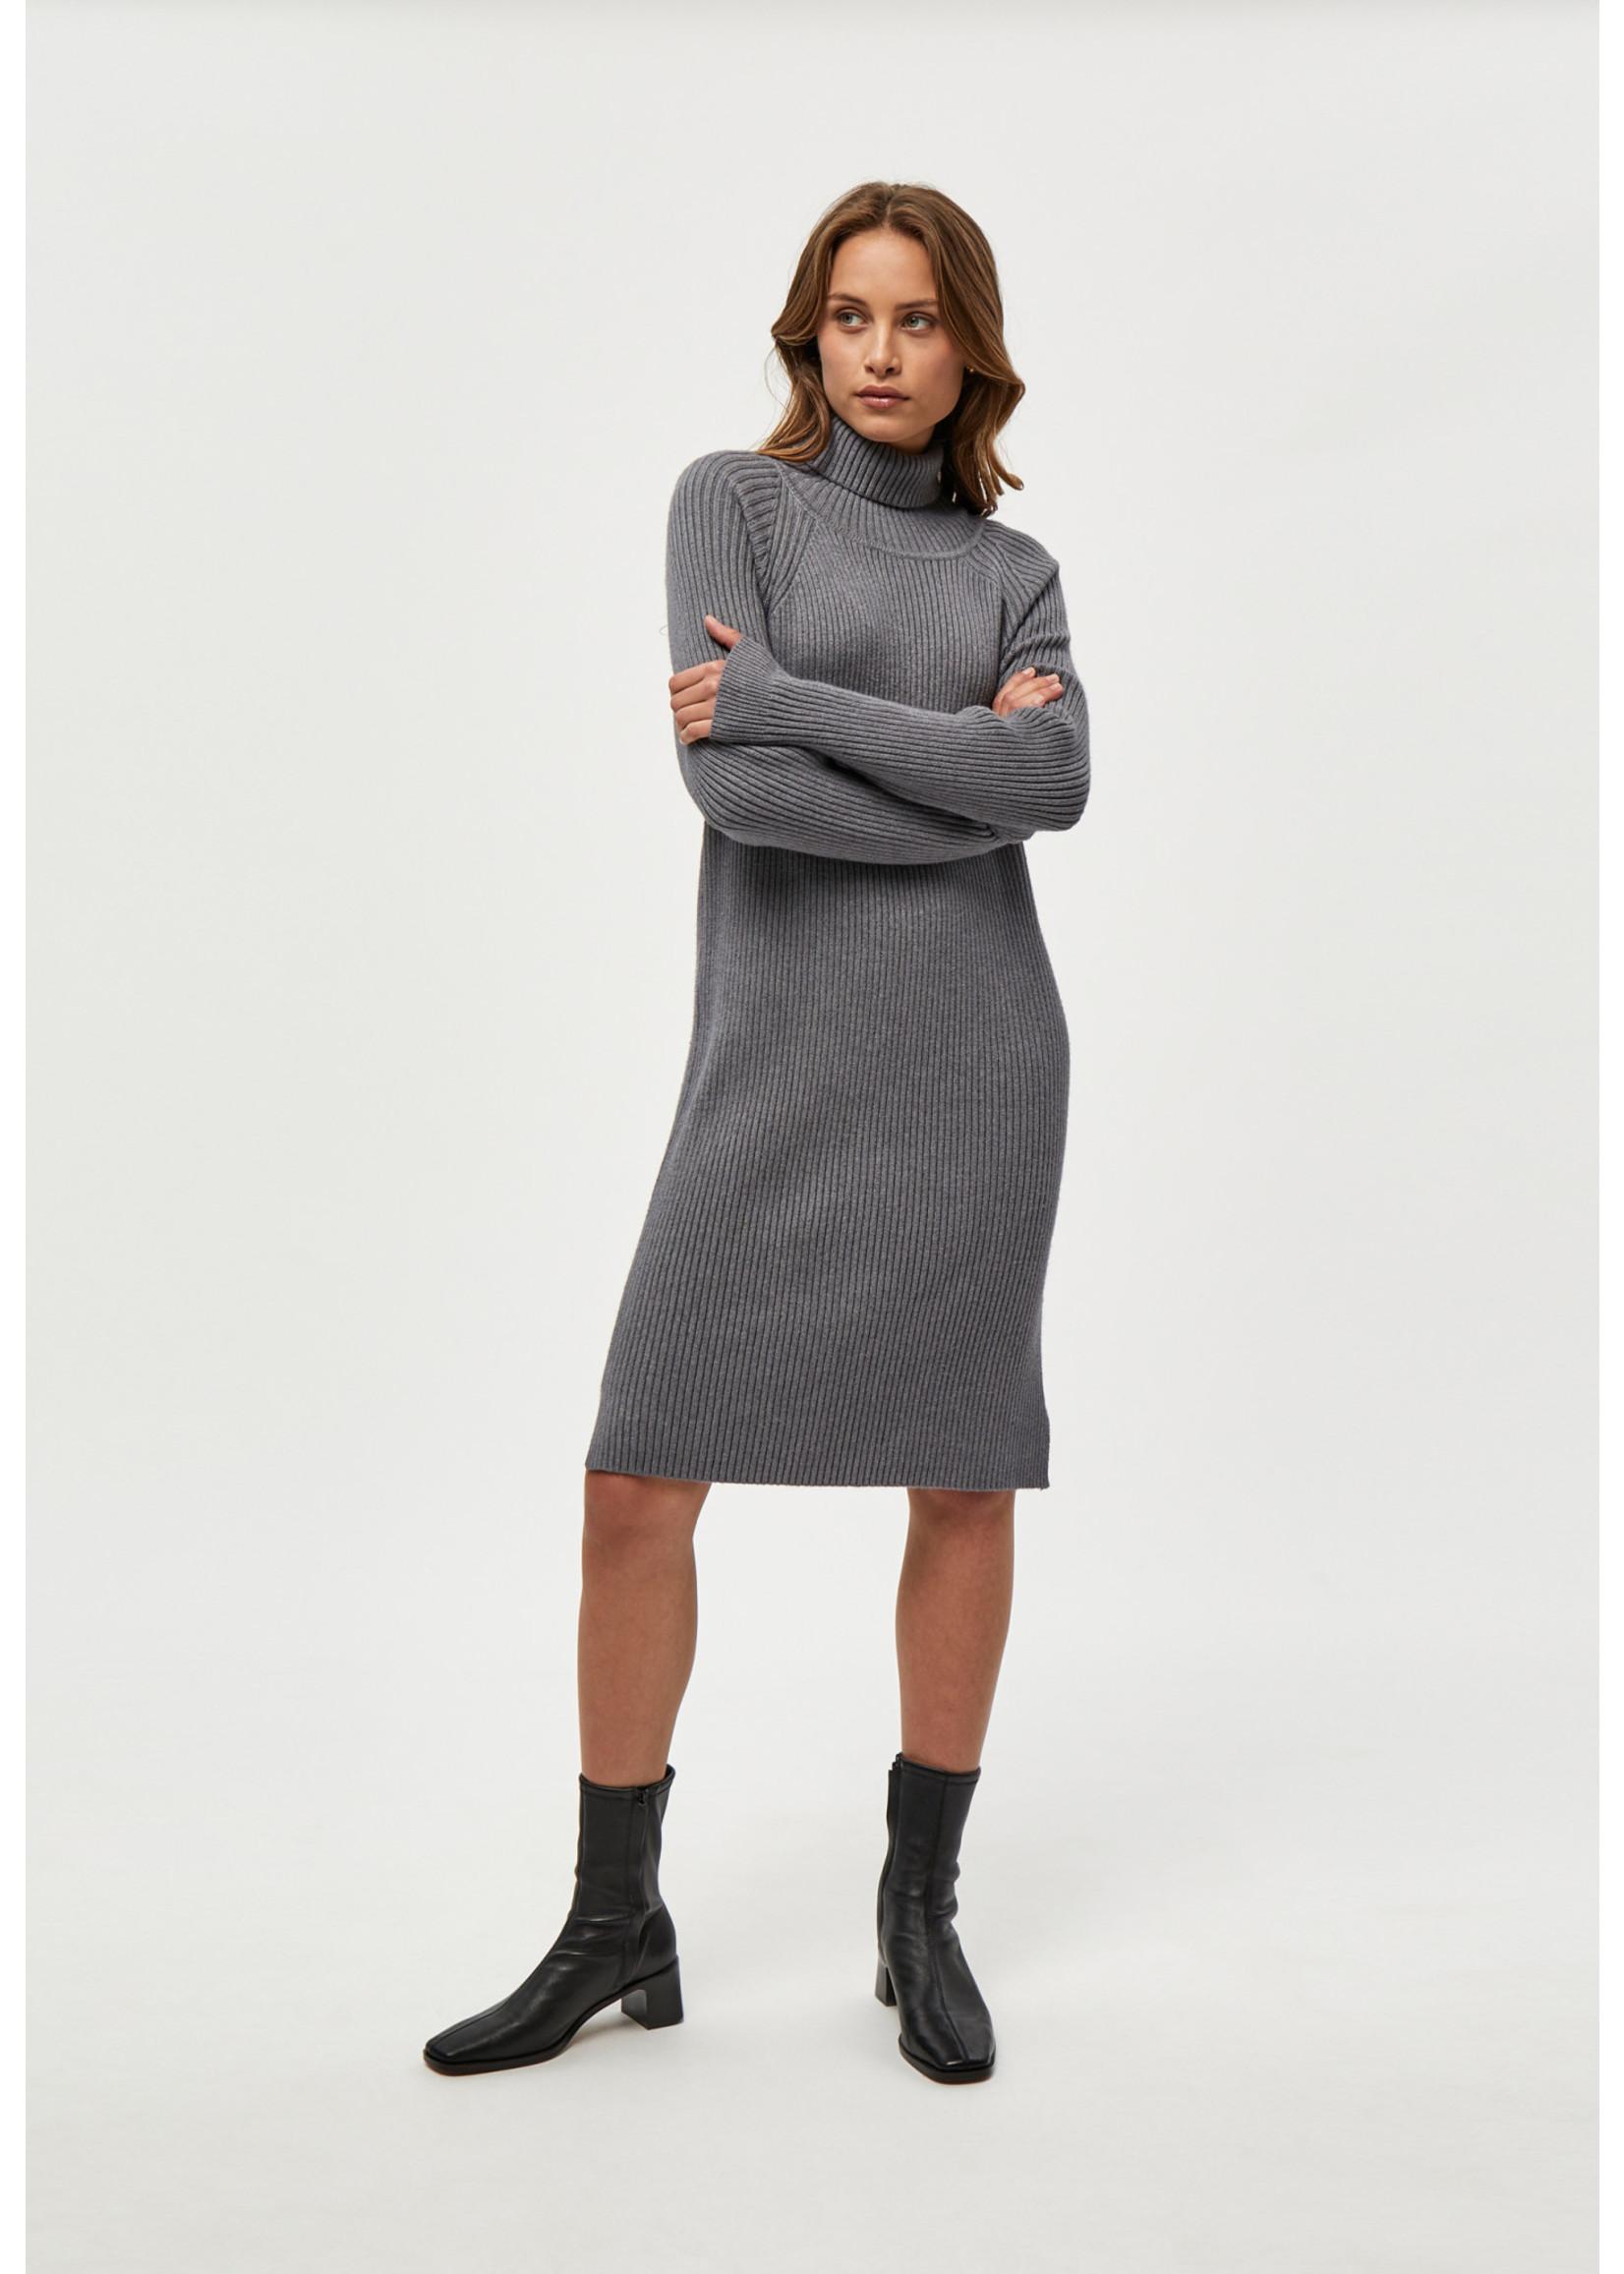 MINUS AVA KNIT TURTLENECK DRESS light grey melange